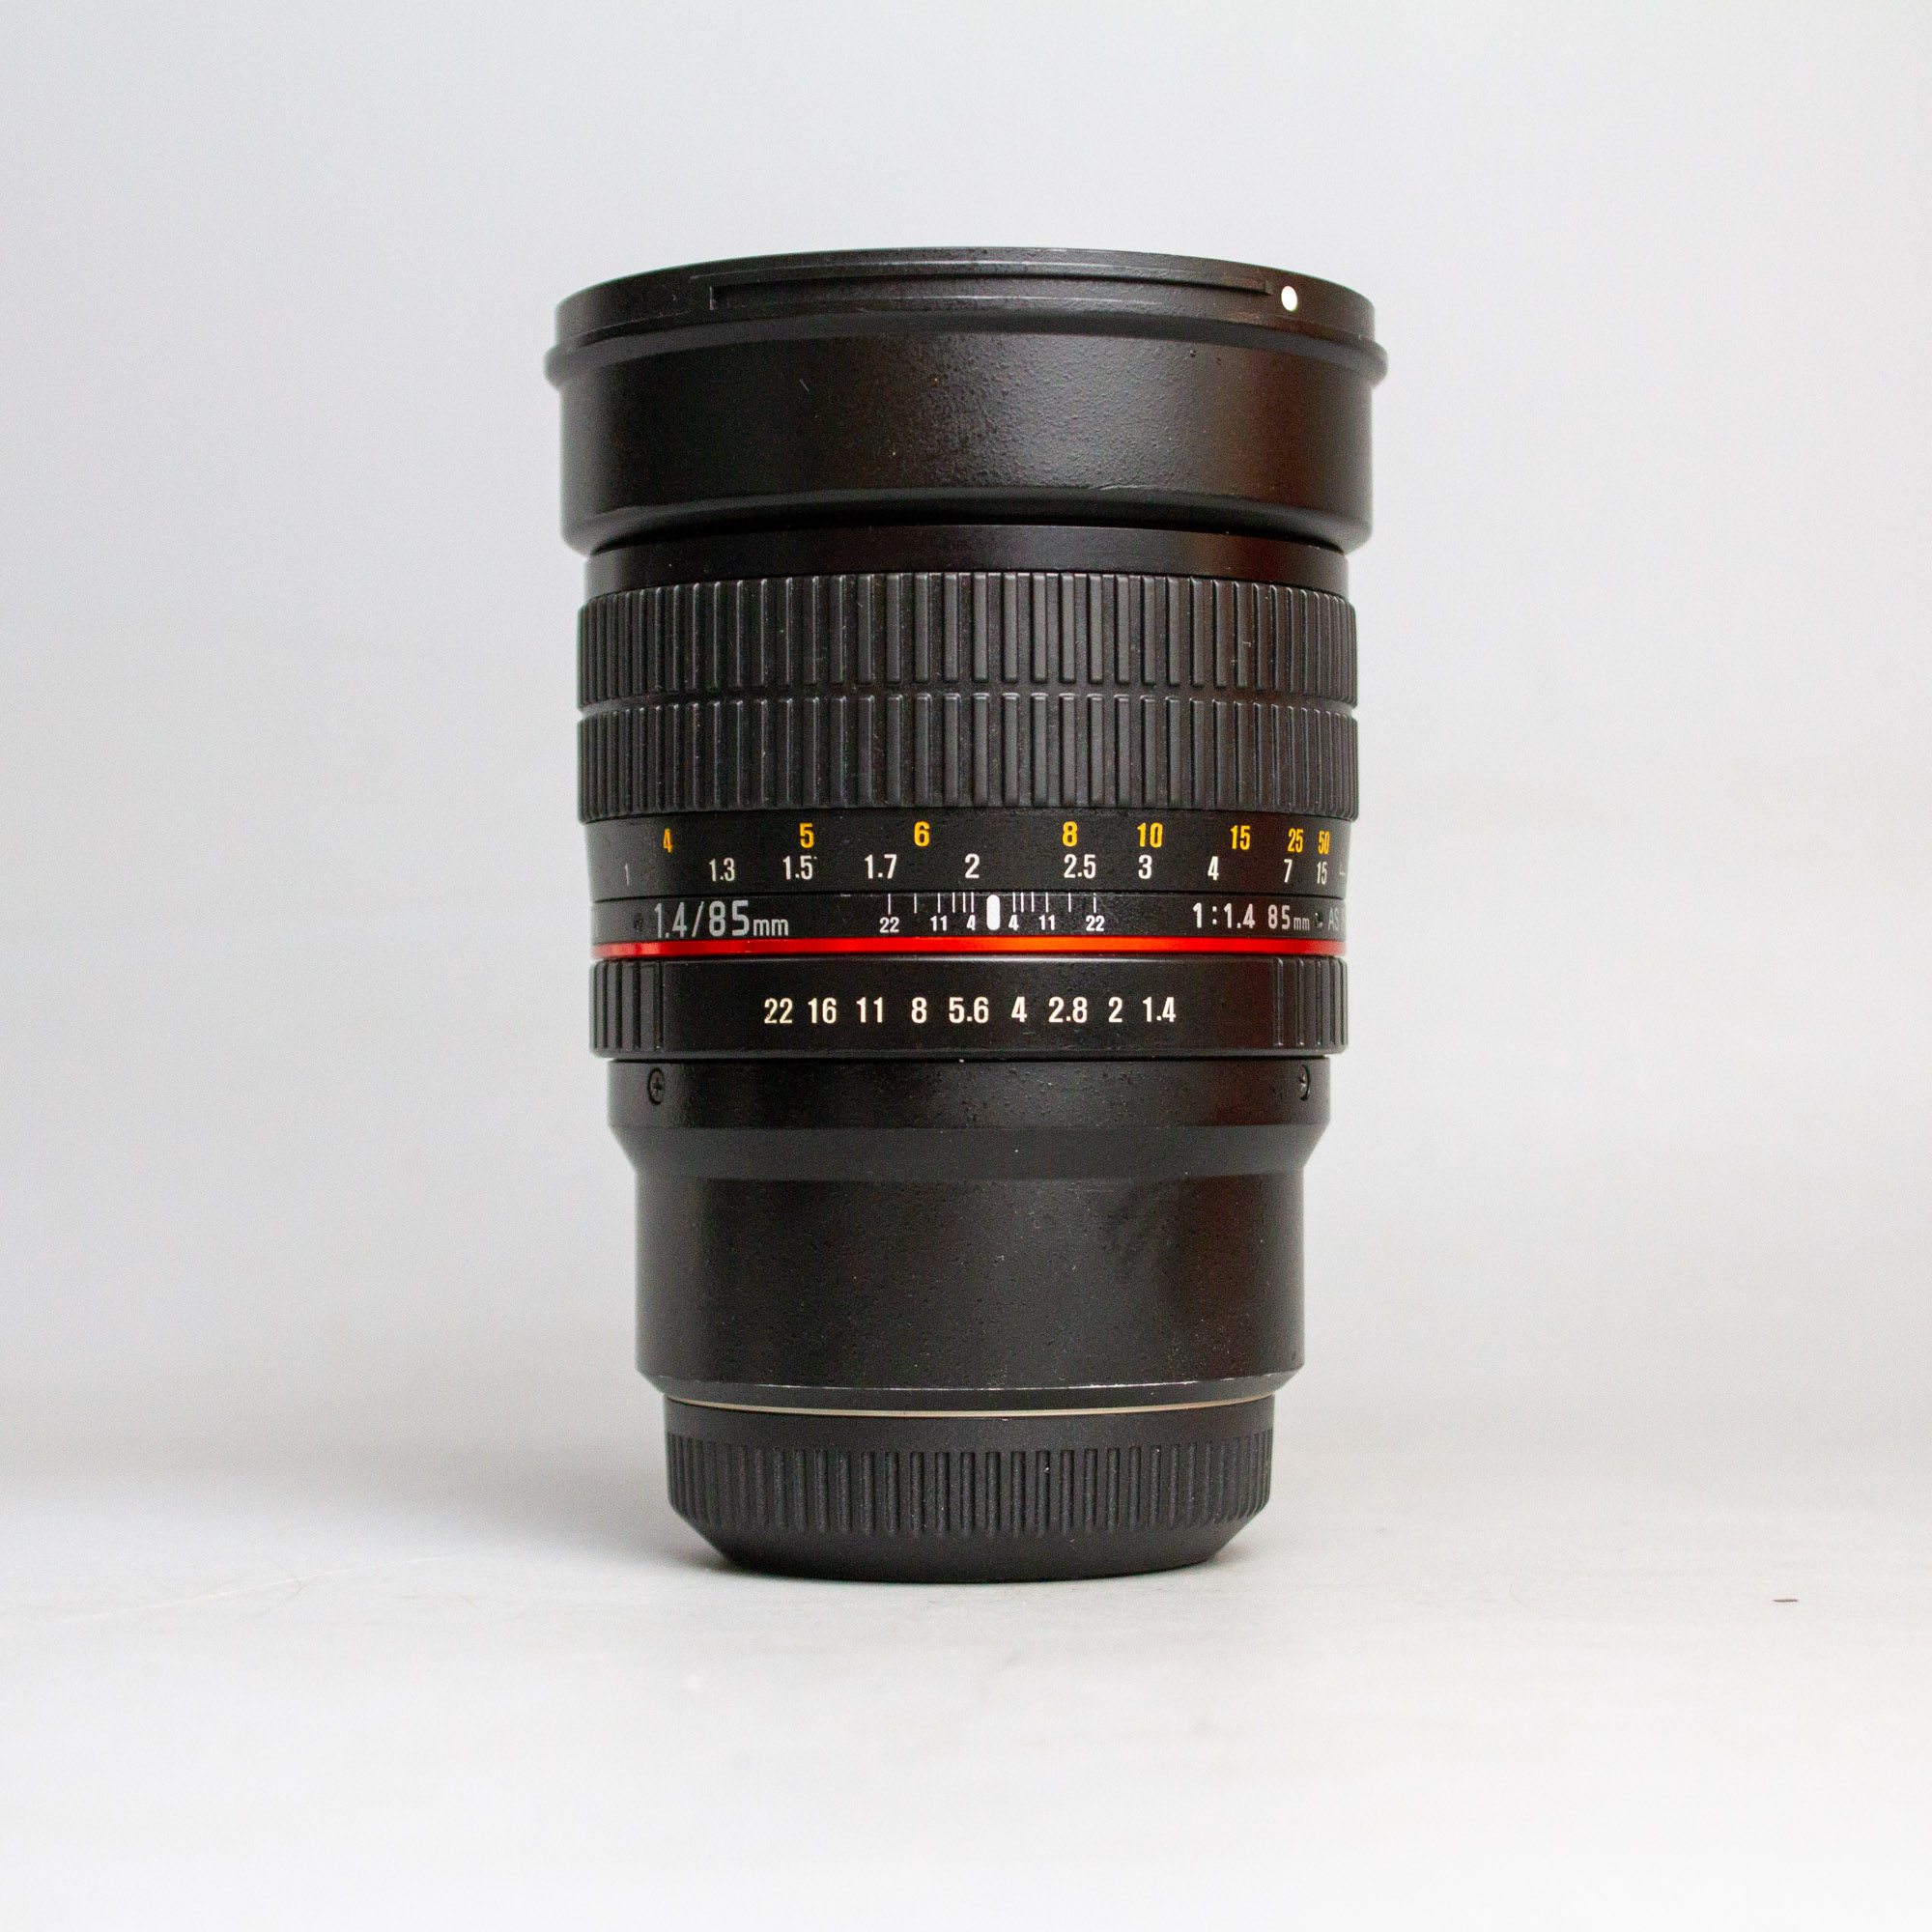 rokinon-samyang-85mm-f1-4-mf-mft-sony-e-85-1-4-18807